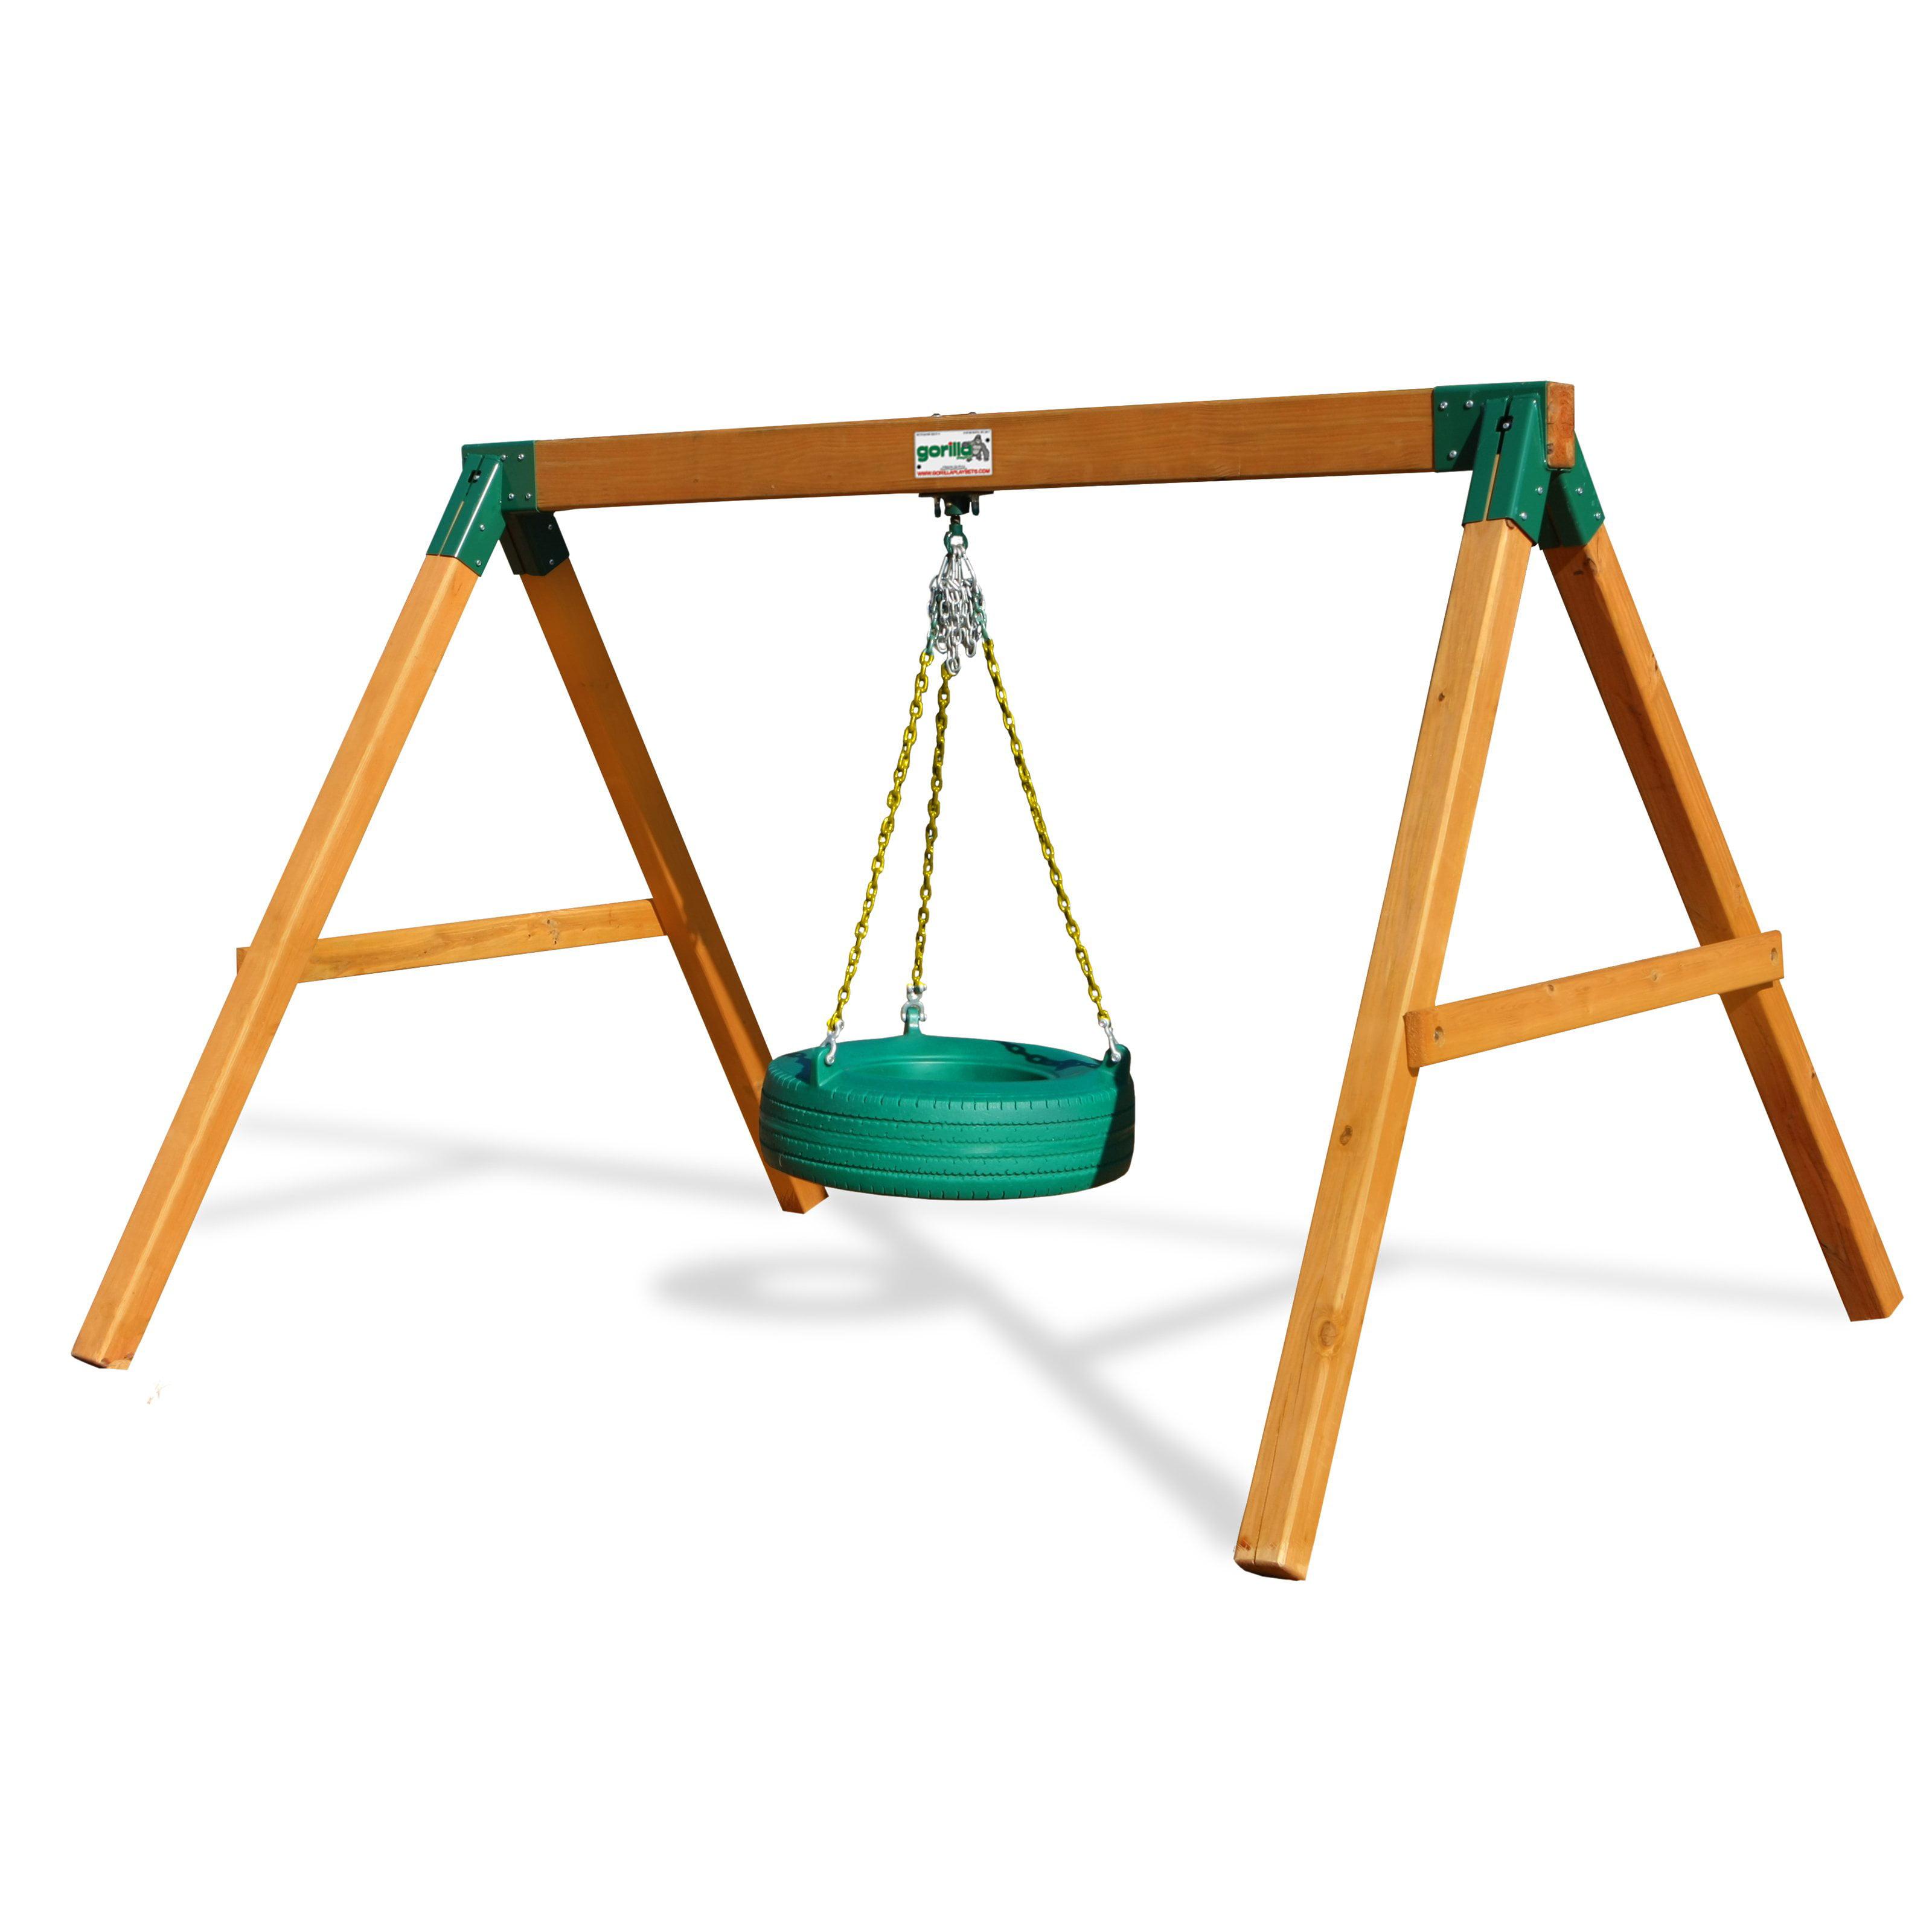 Gorilla Playsets Free Standing Tire Swing Set